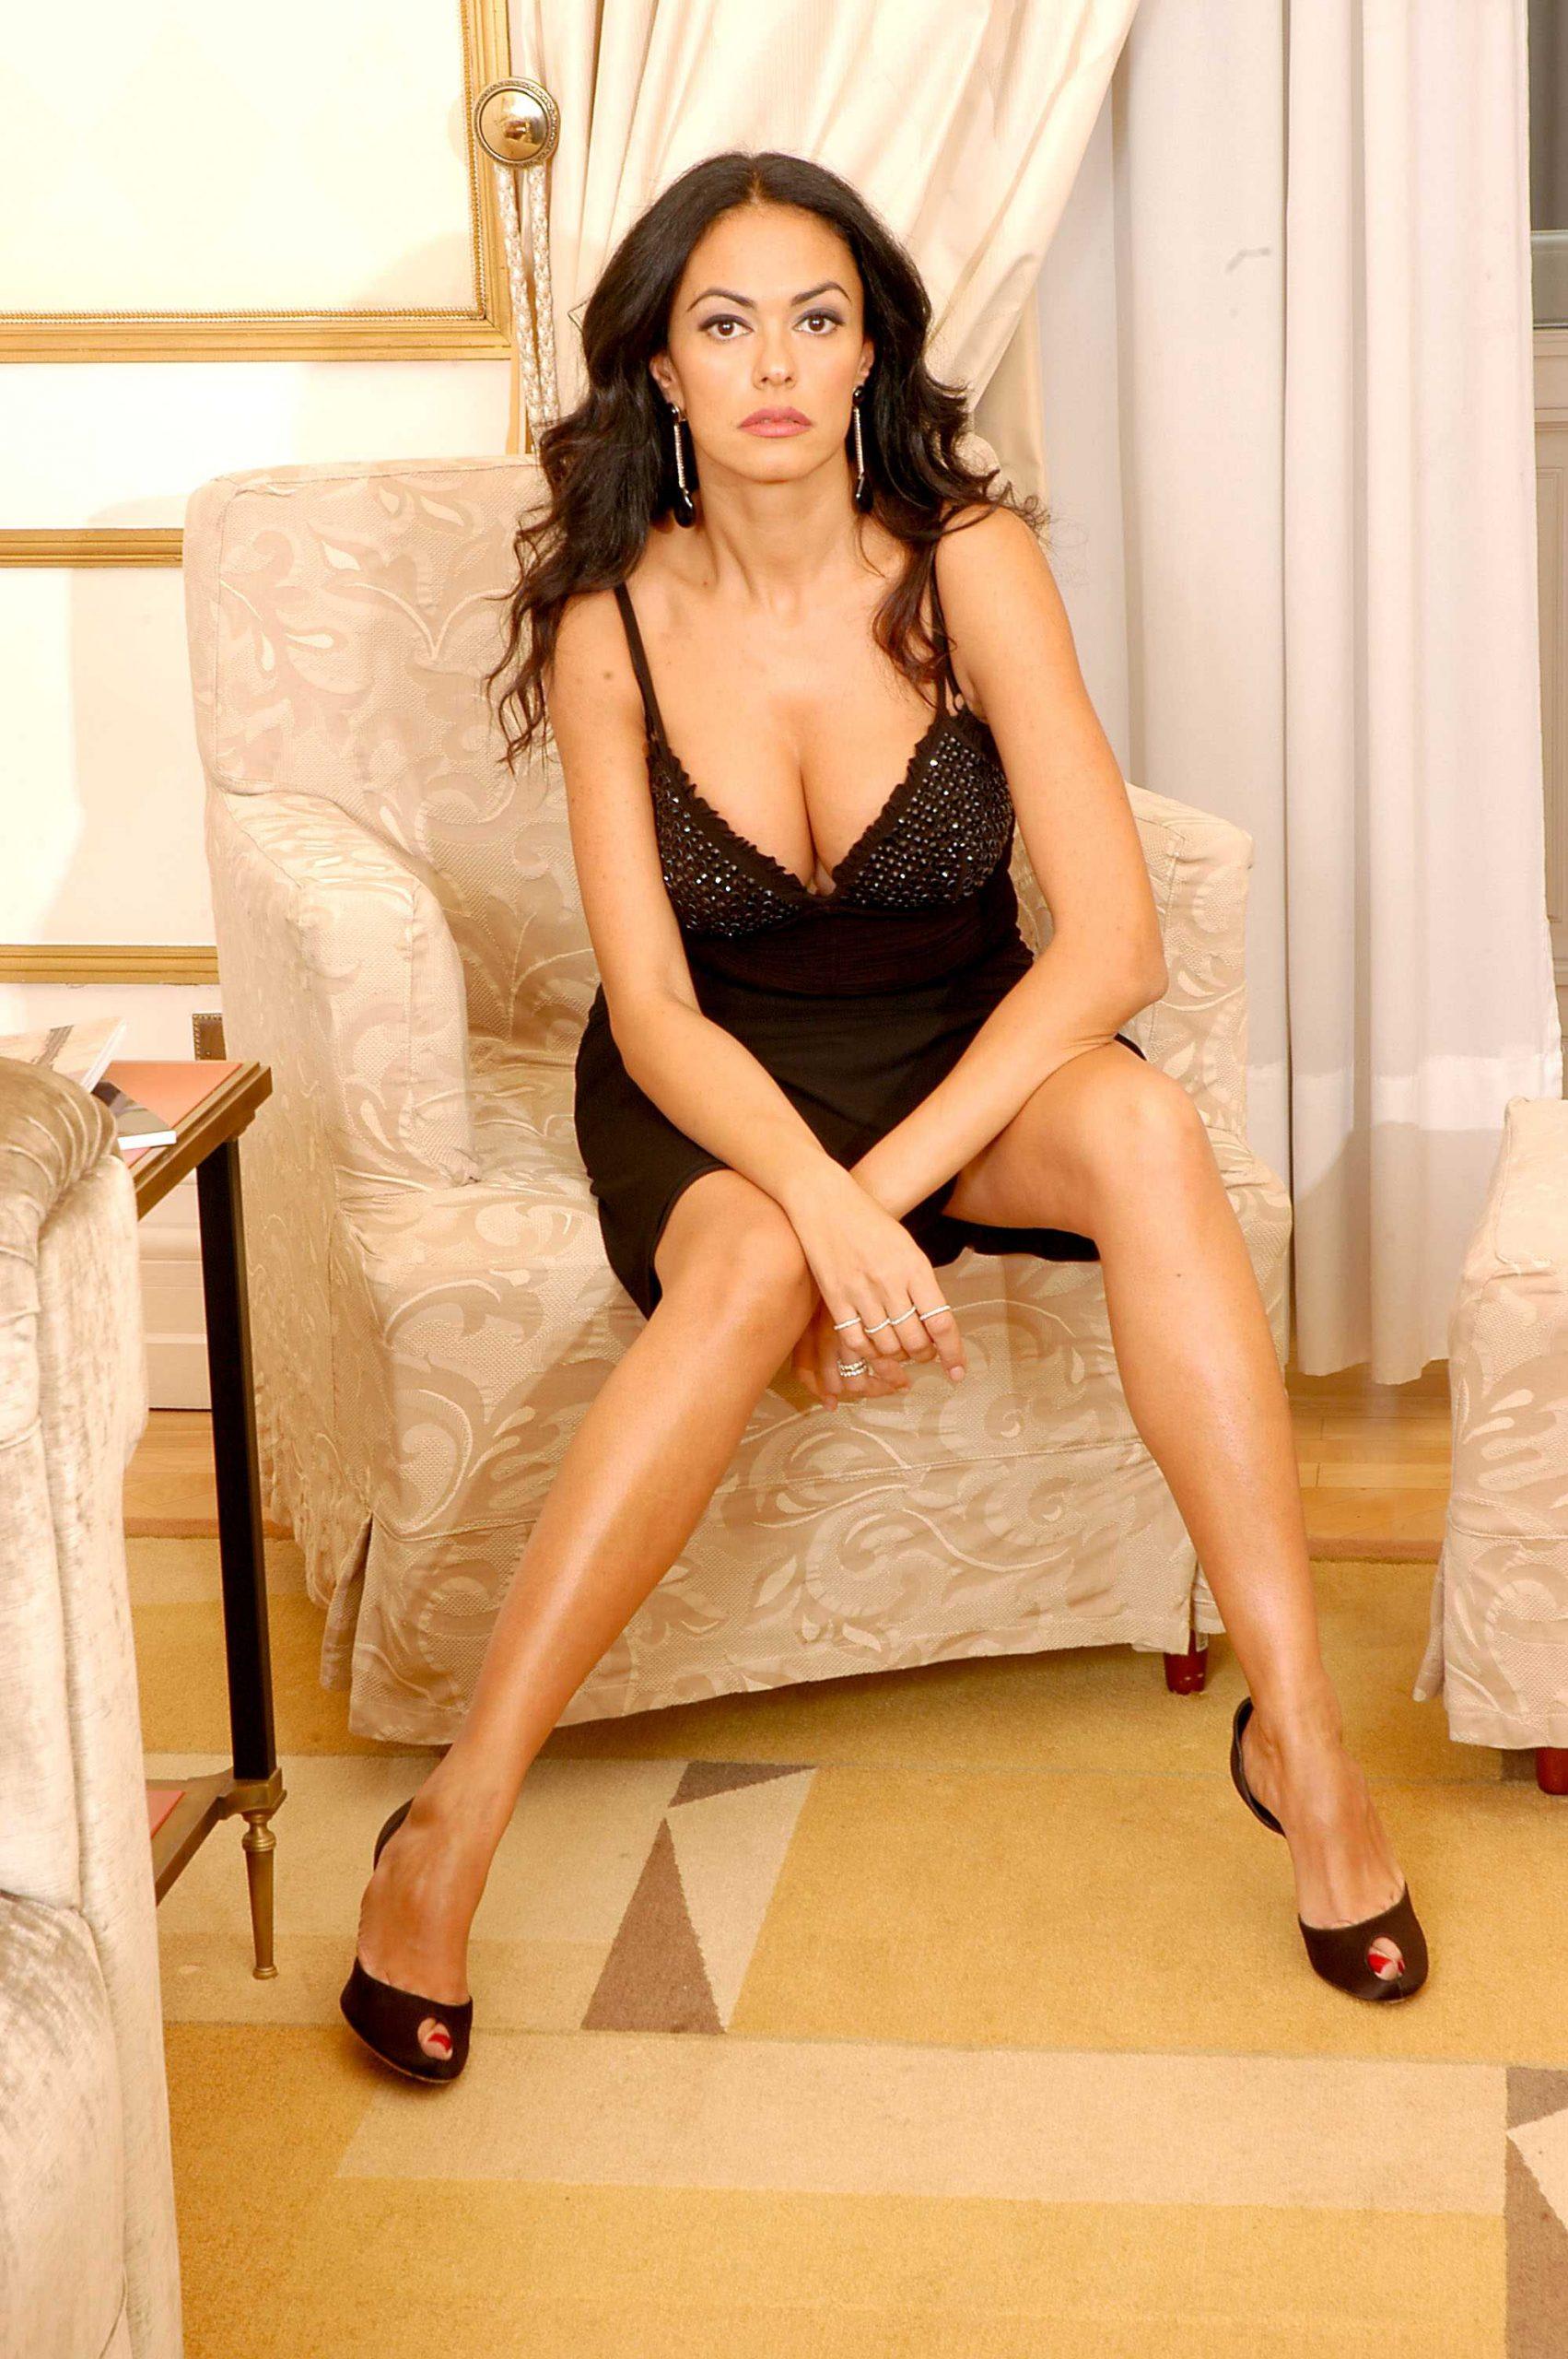 Maria Grazia Cucinotta awesome